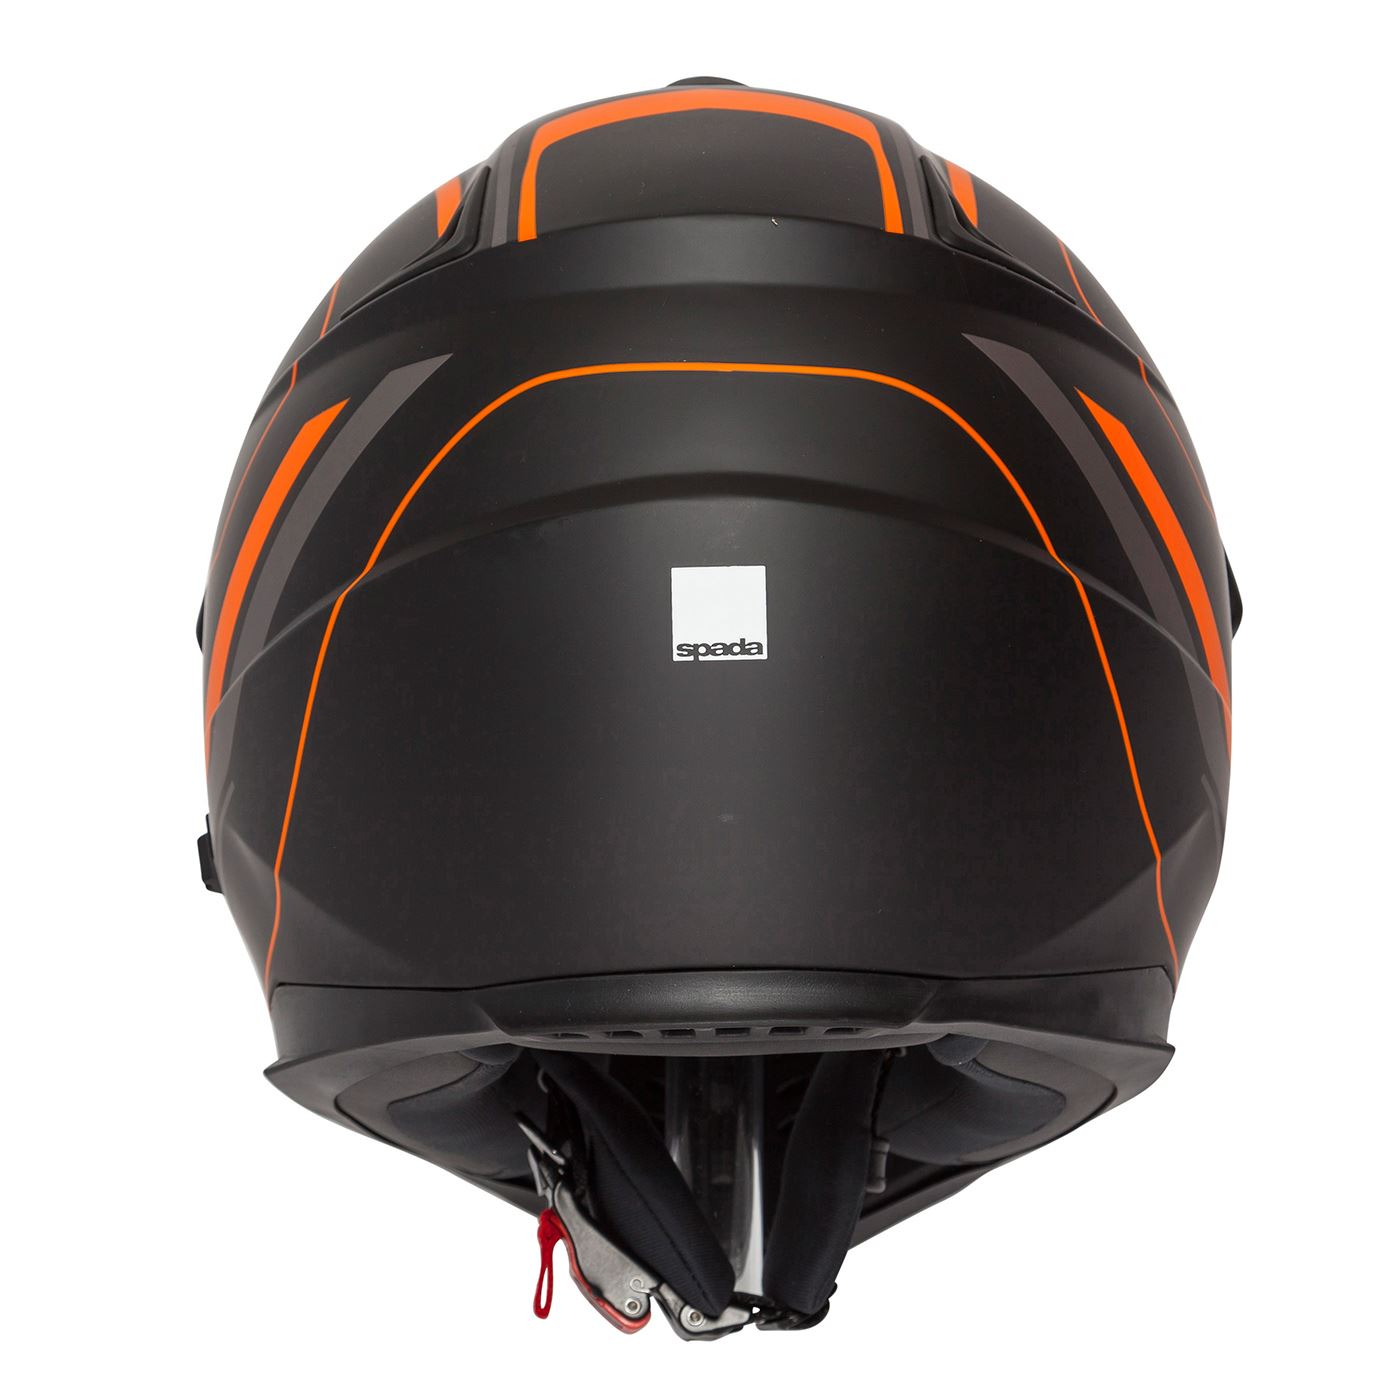 Spada-Intrepid-Full-Face-Motorcycle-Off-Road-Adventure-Style-Helmet-Sun-Visor thumbnail 24